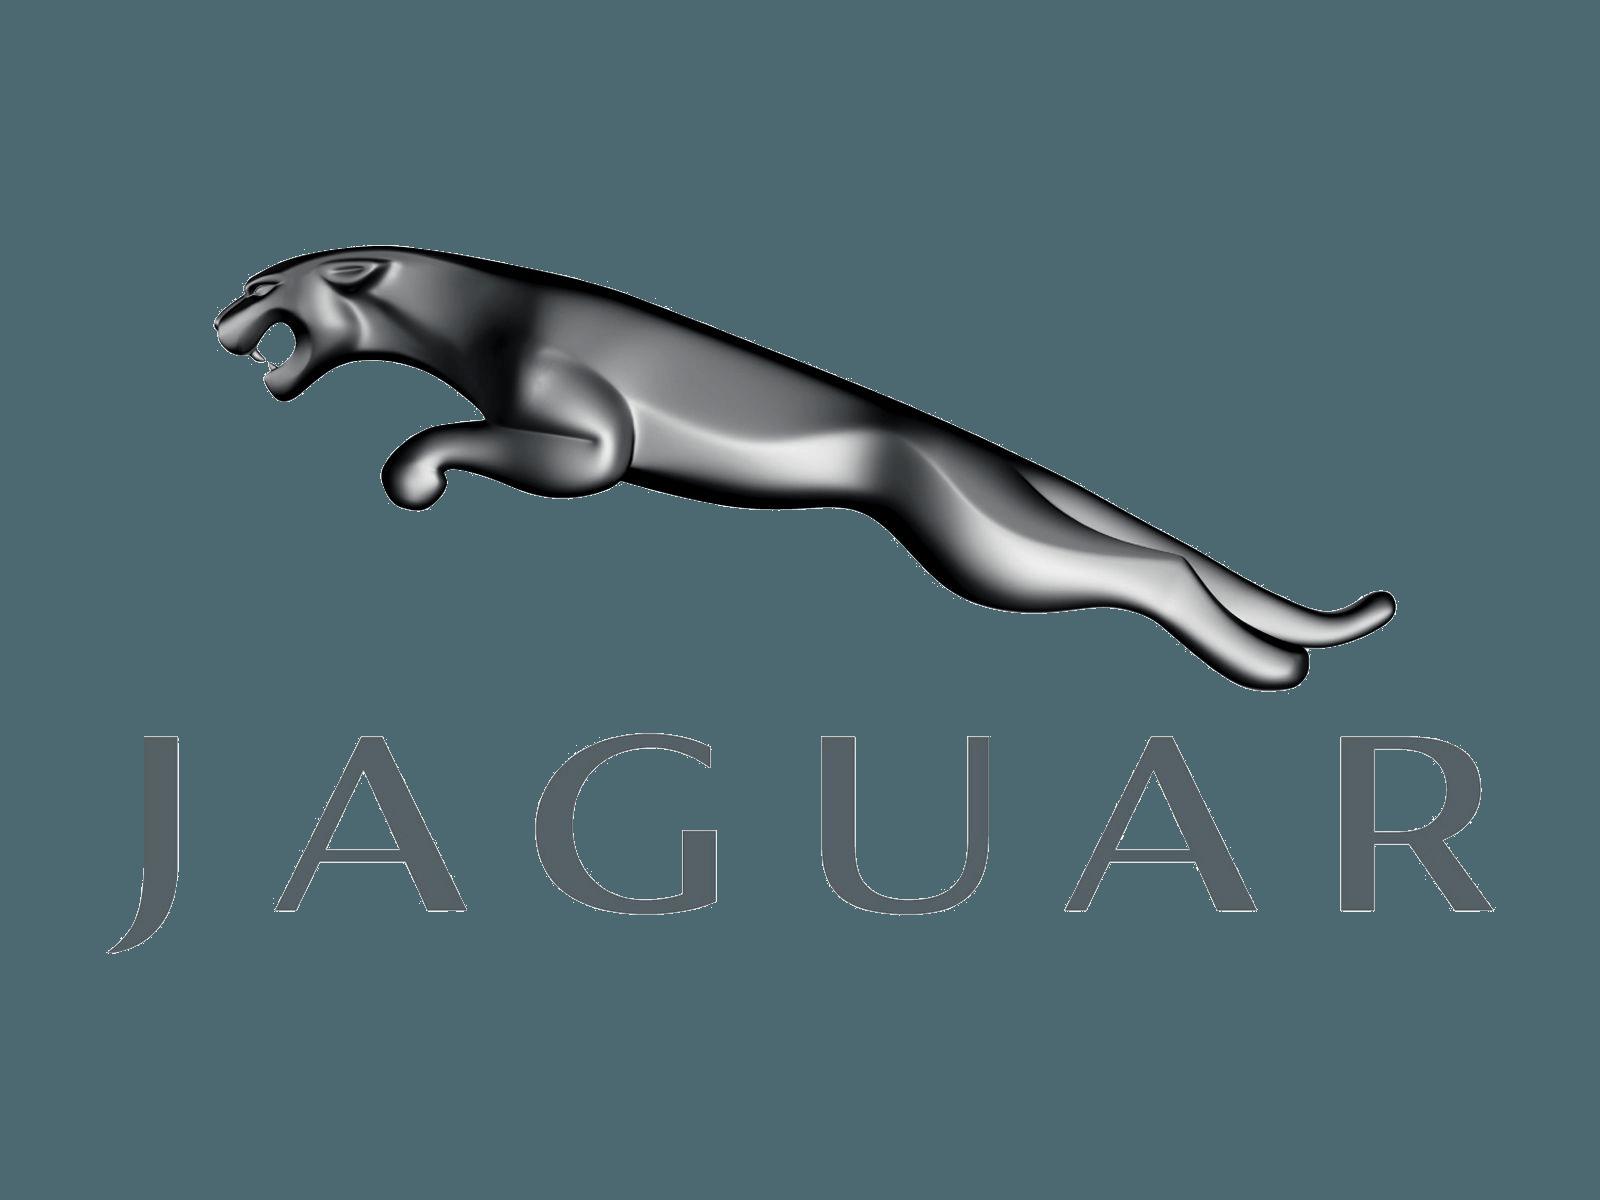 Clipart basketball jaguar. Download car logo png